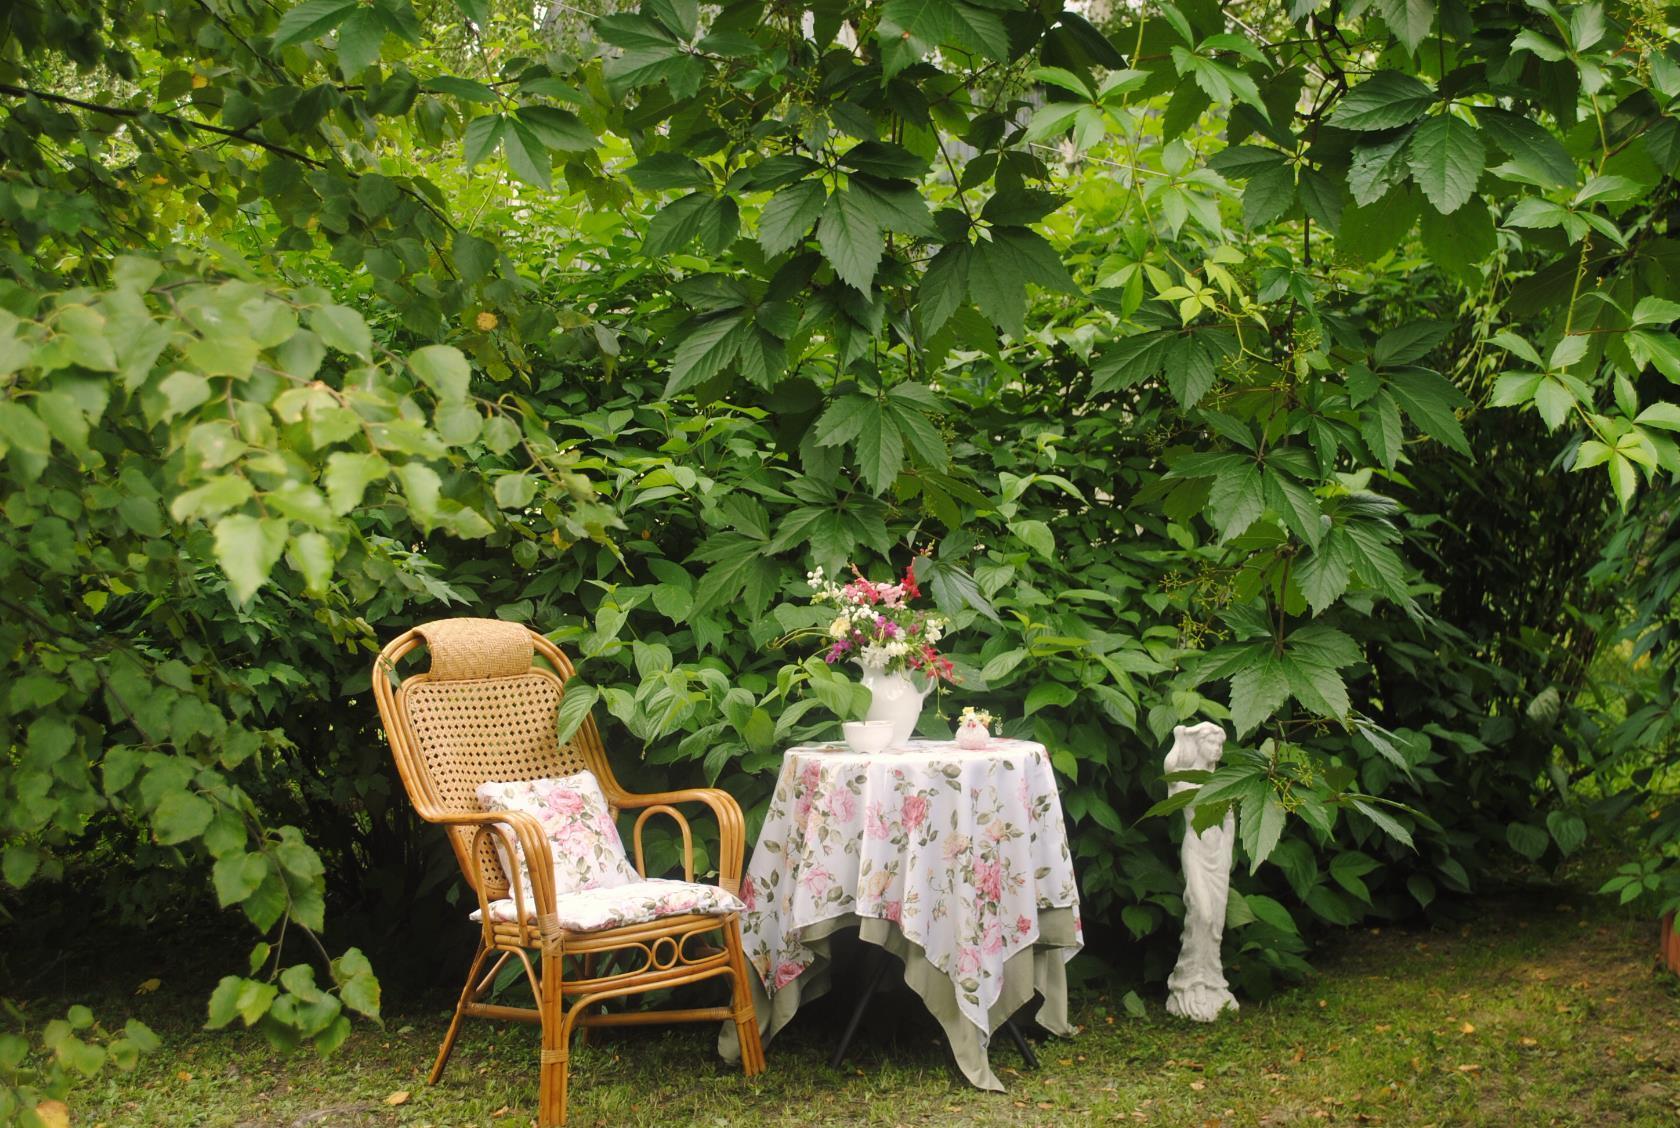 стол в саду и кресло